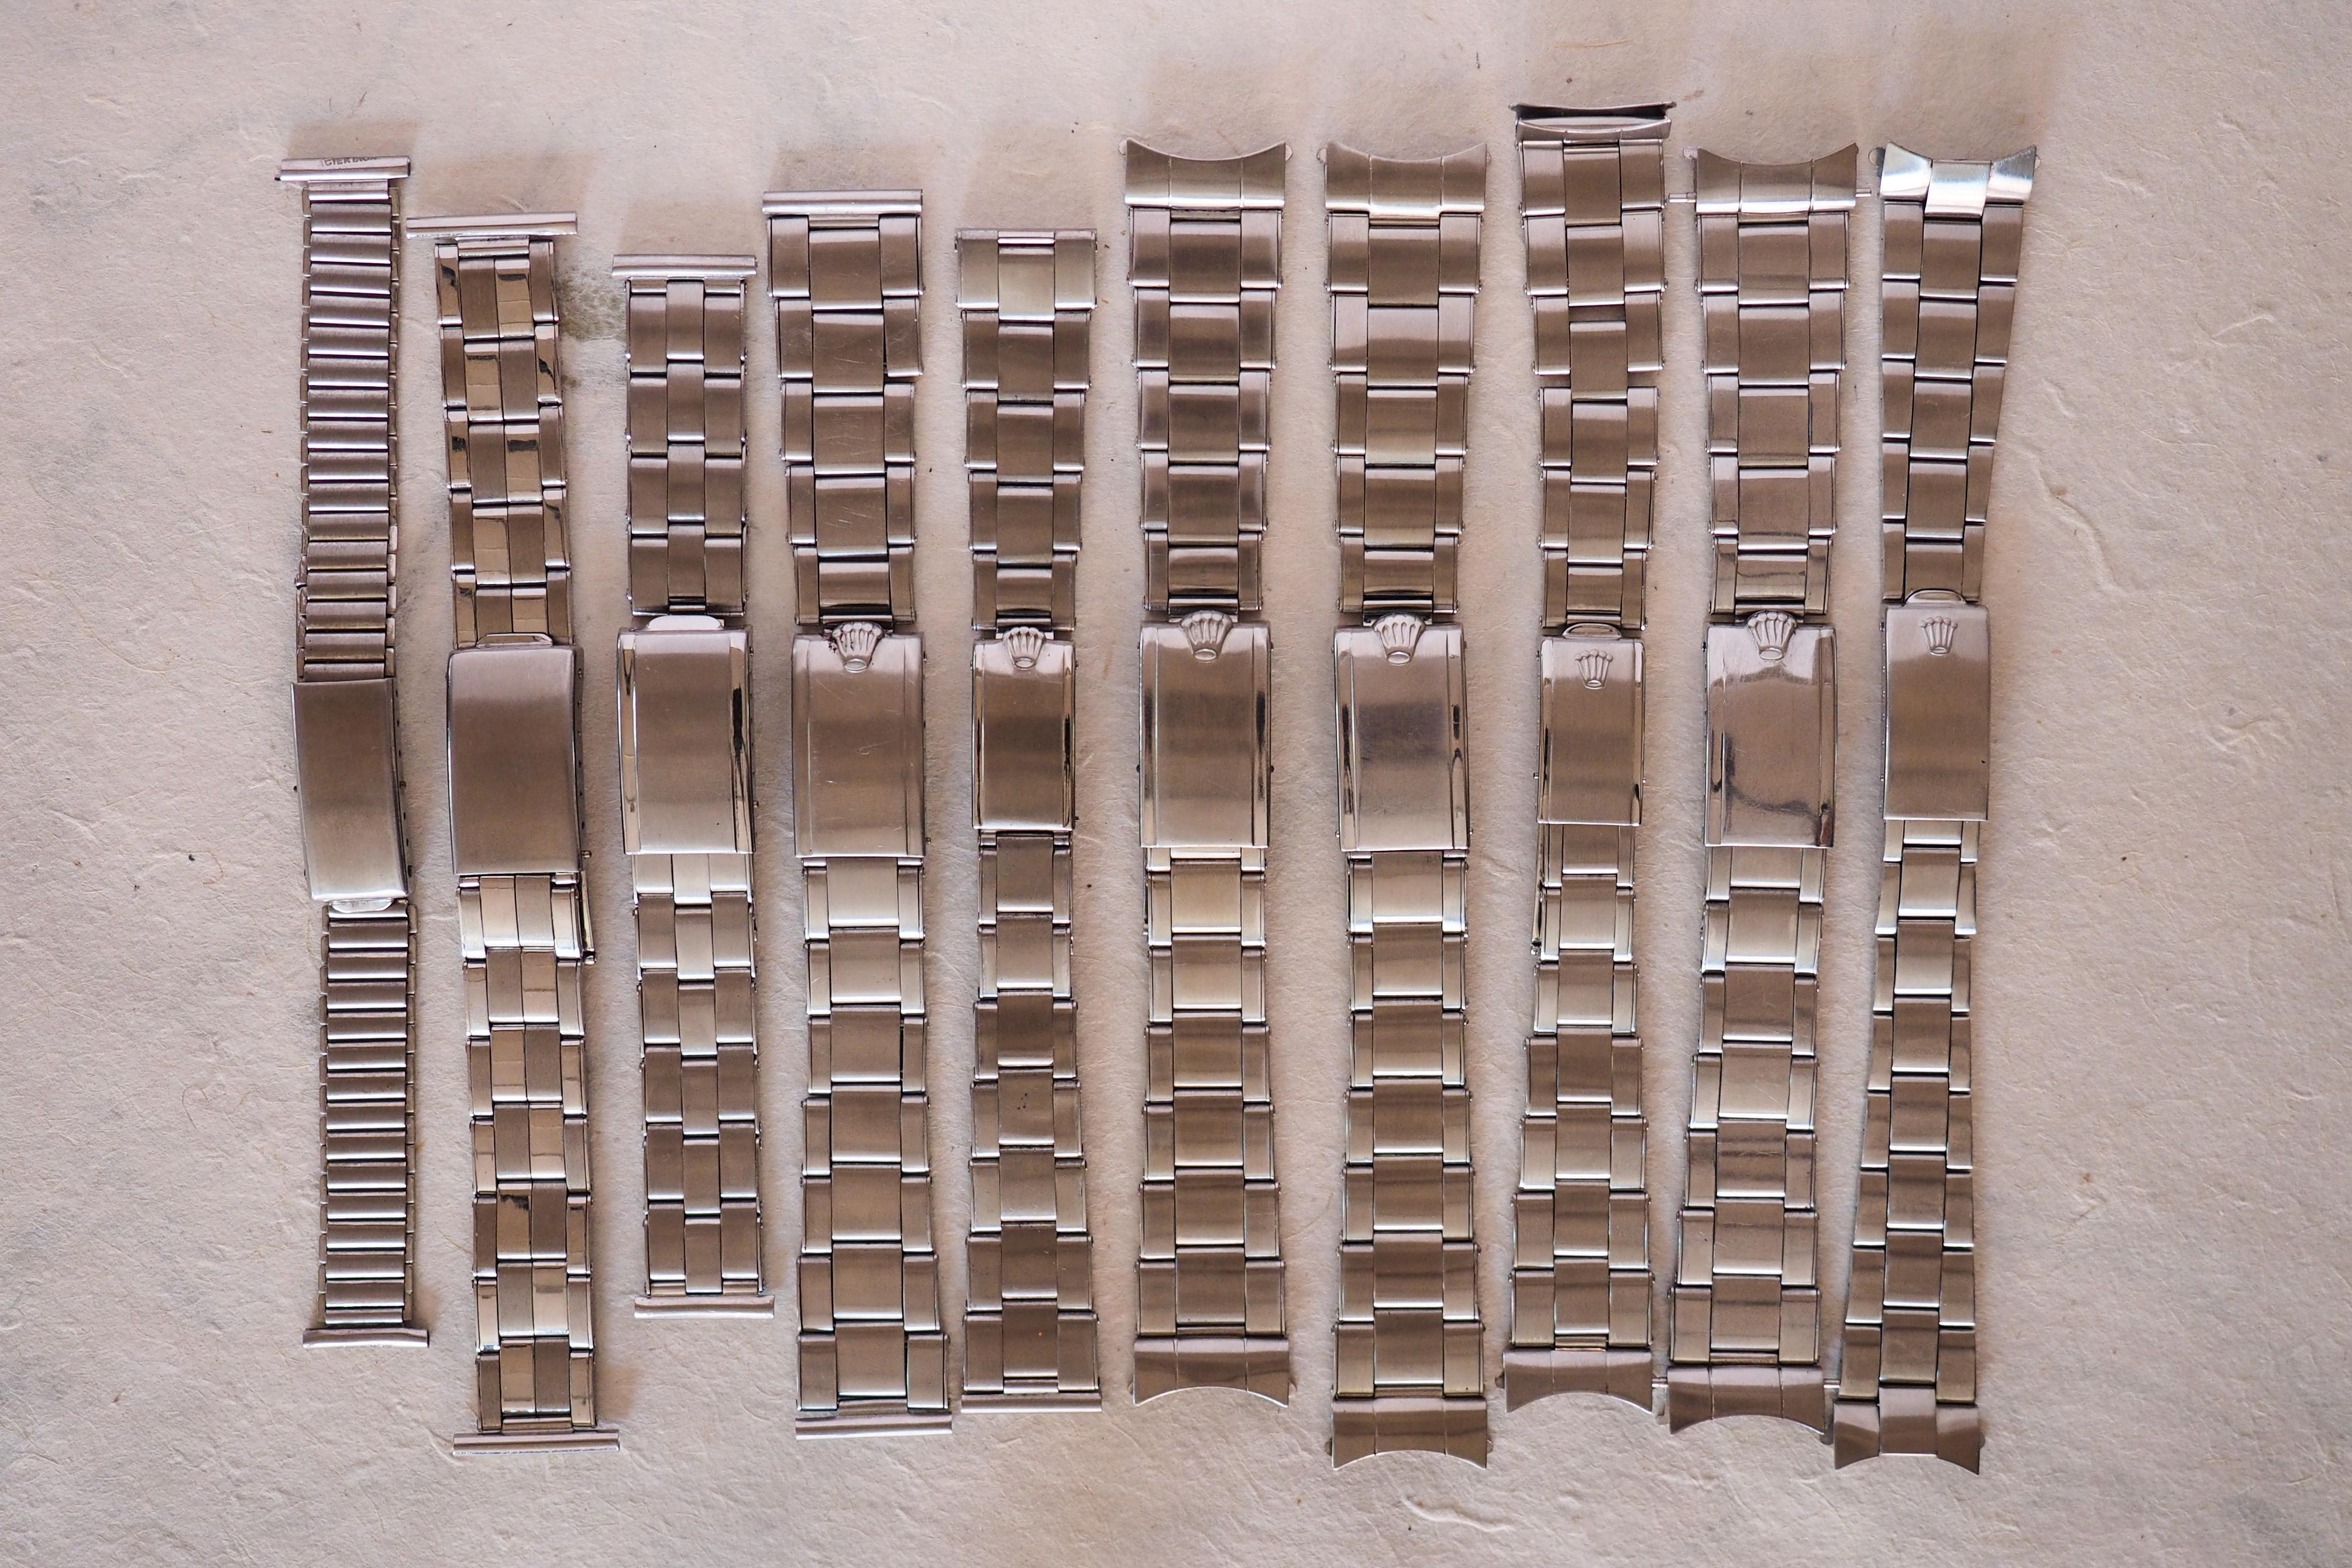 Historia das famosas braceletes oyster da Rolex P7140104